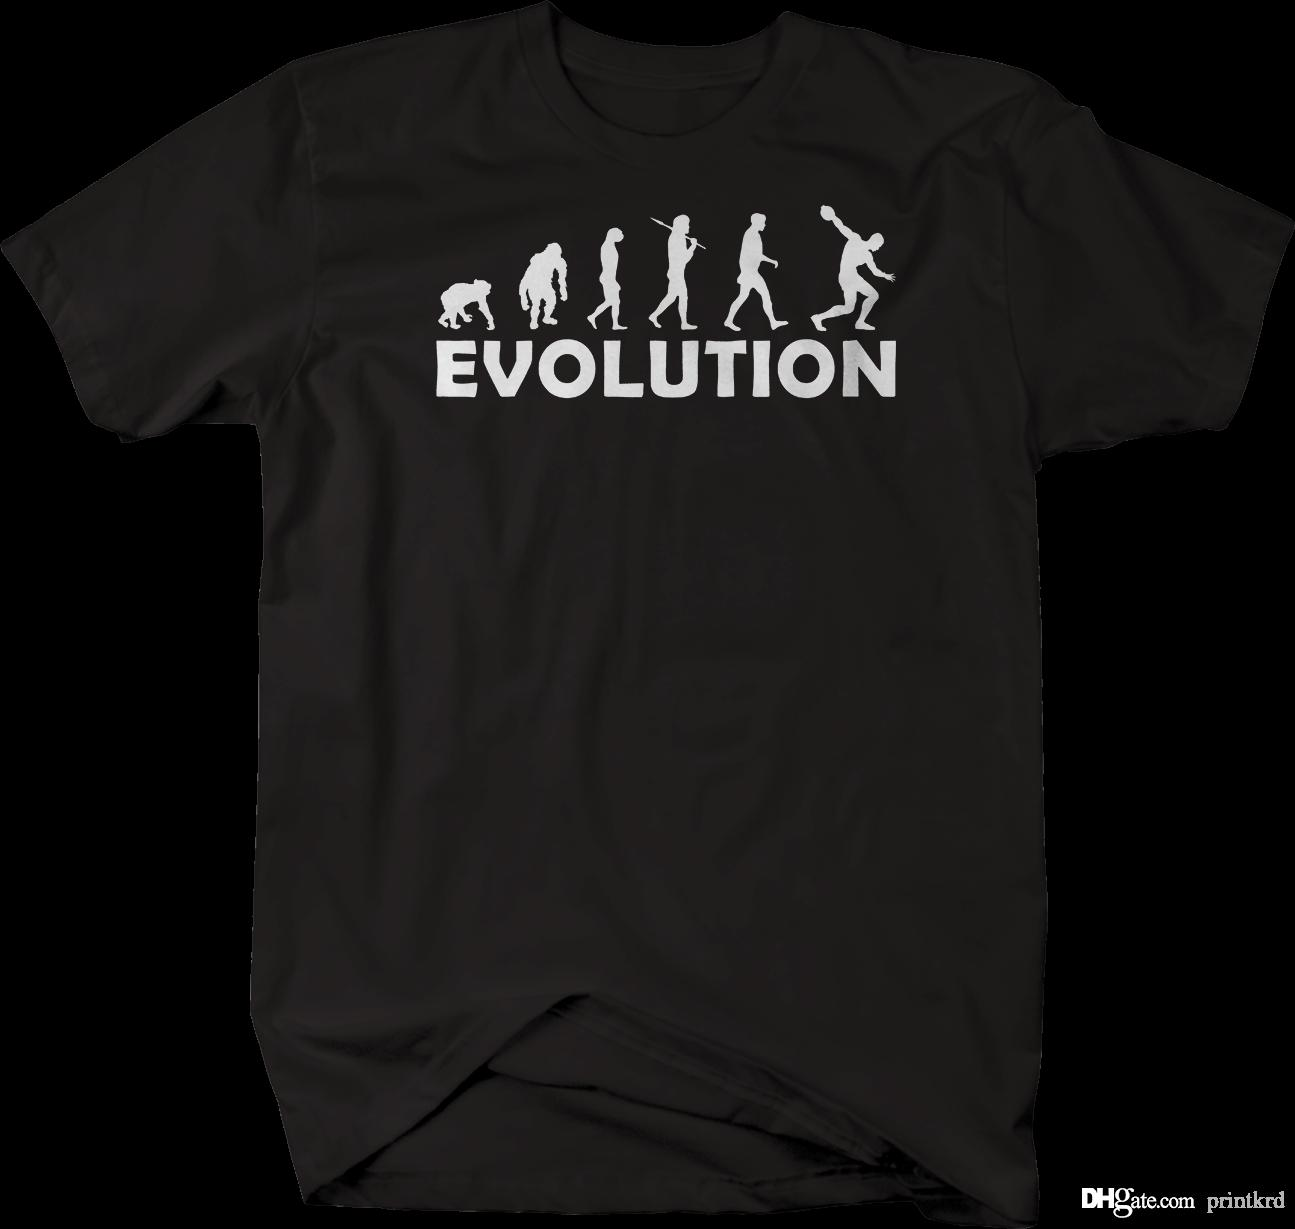 Evolution Of Man Discus Track Field Tshirt White T Shirt Designs